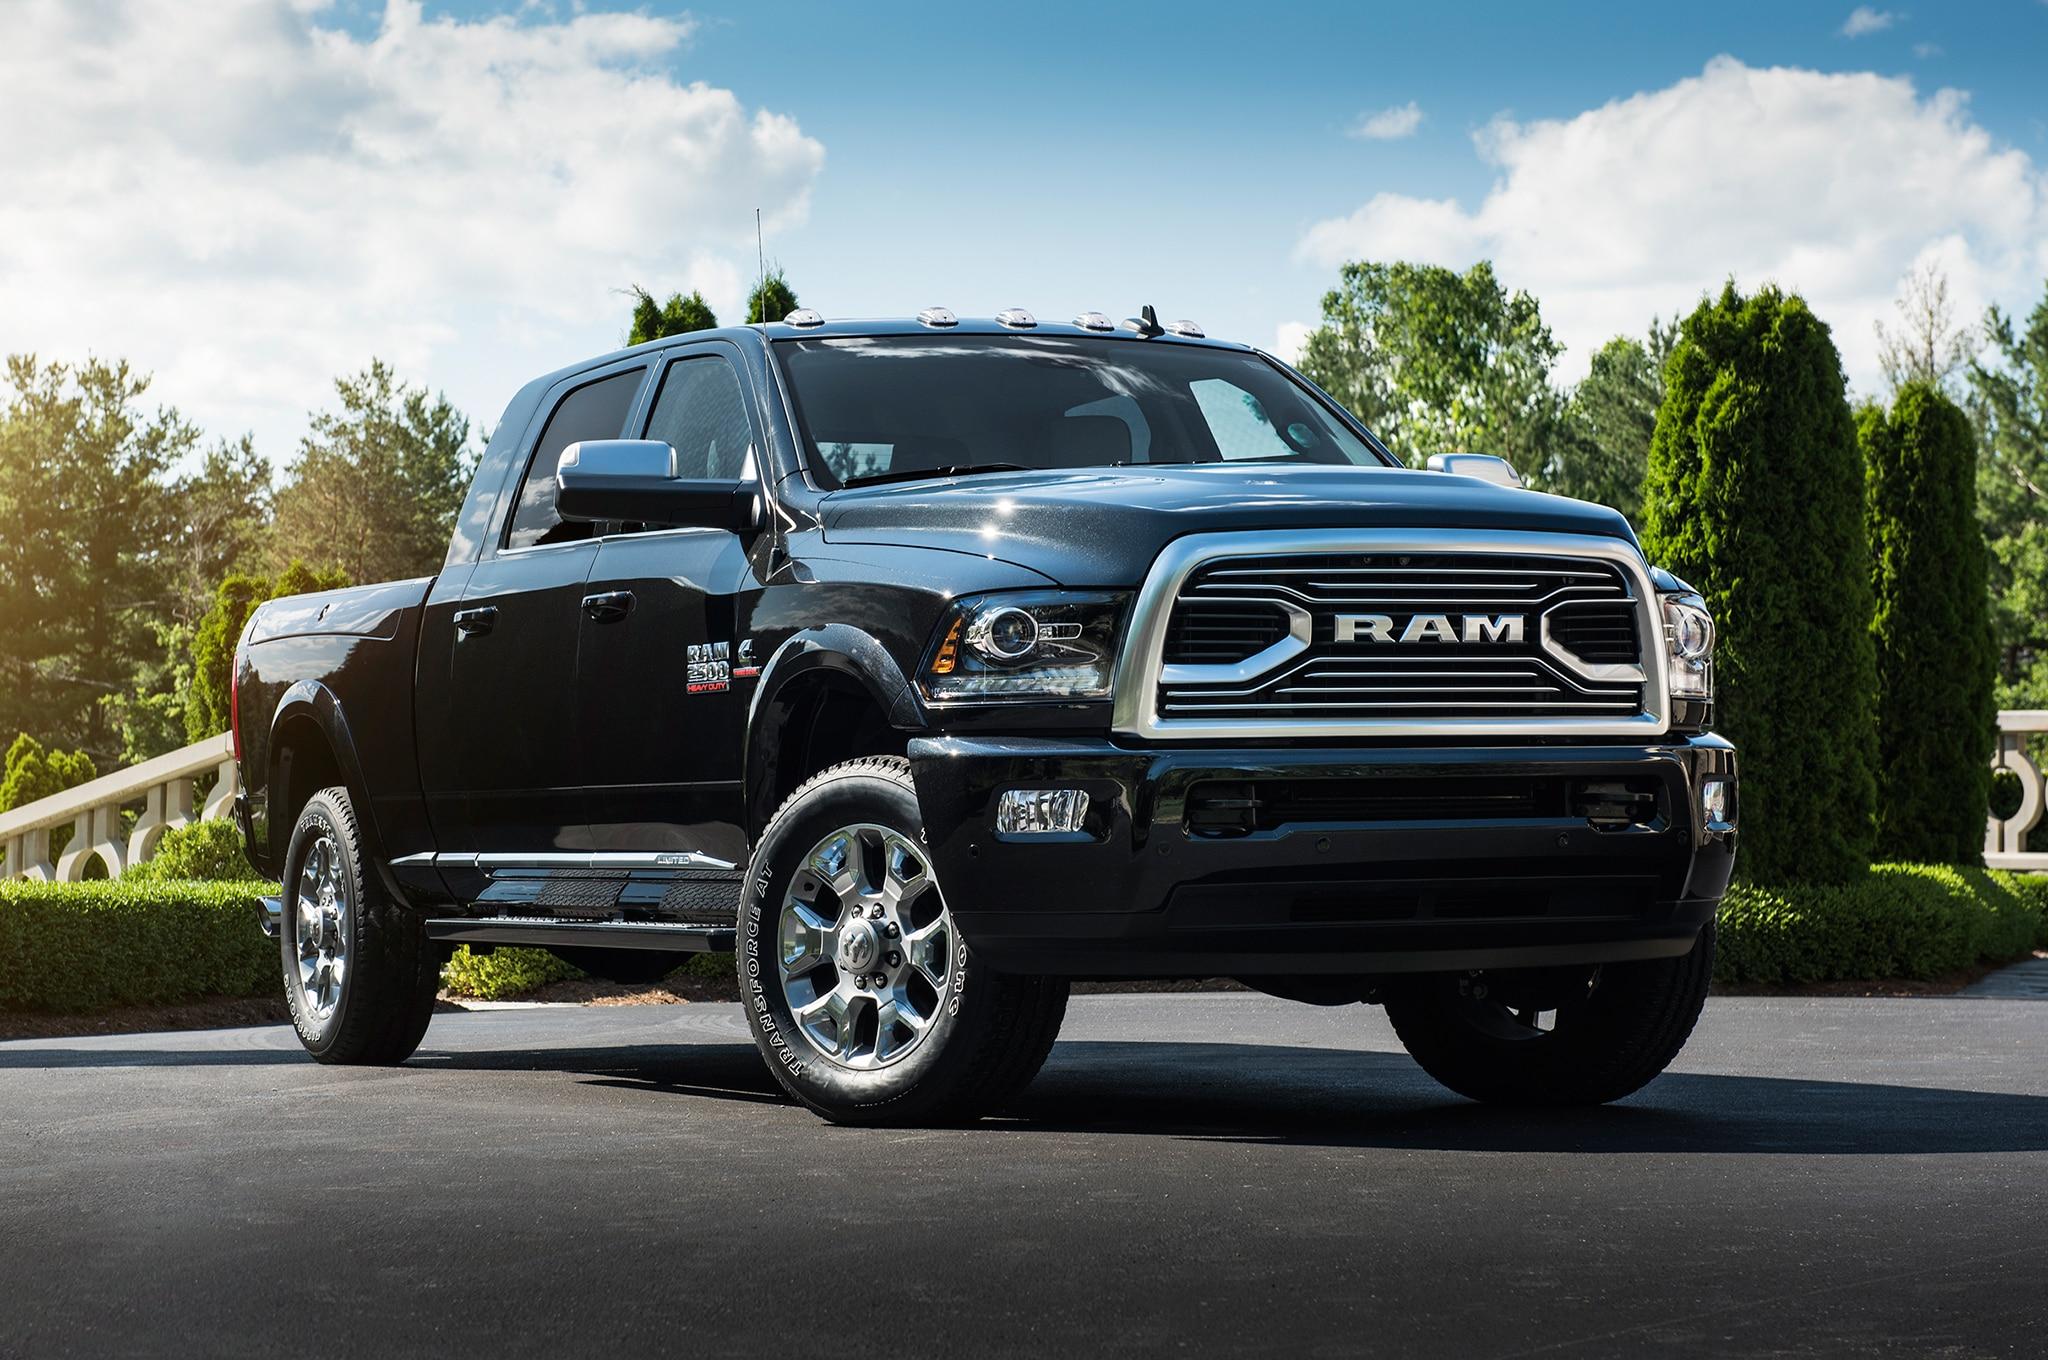 Llaman a revisión alrededor de 500,000 camionetas Ram ...